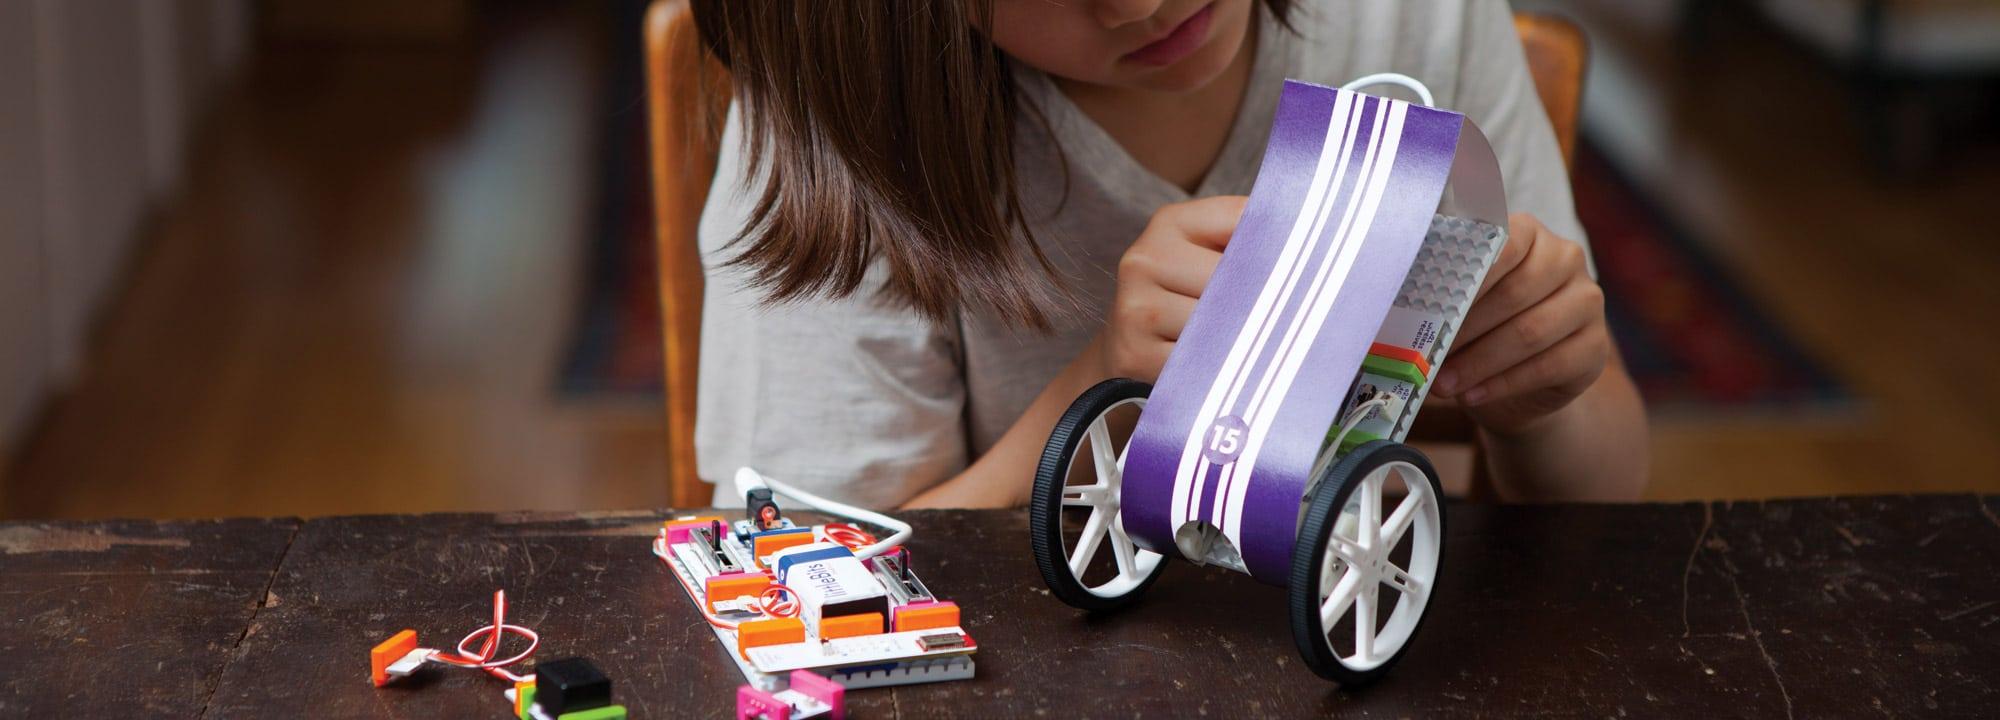 Bastlen und Tüfteln. (Foto: littleBits)